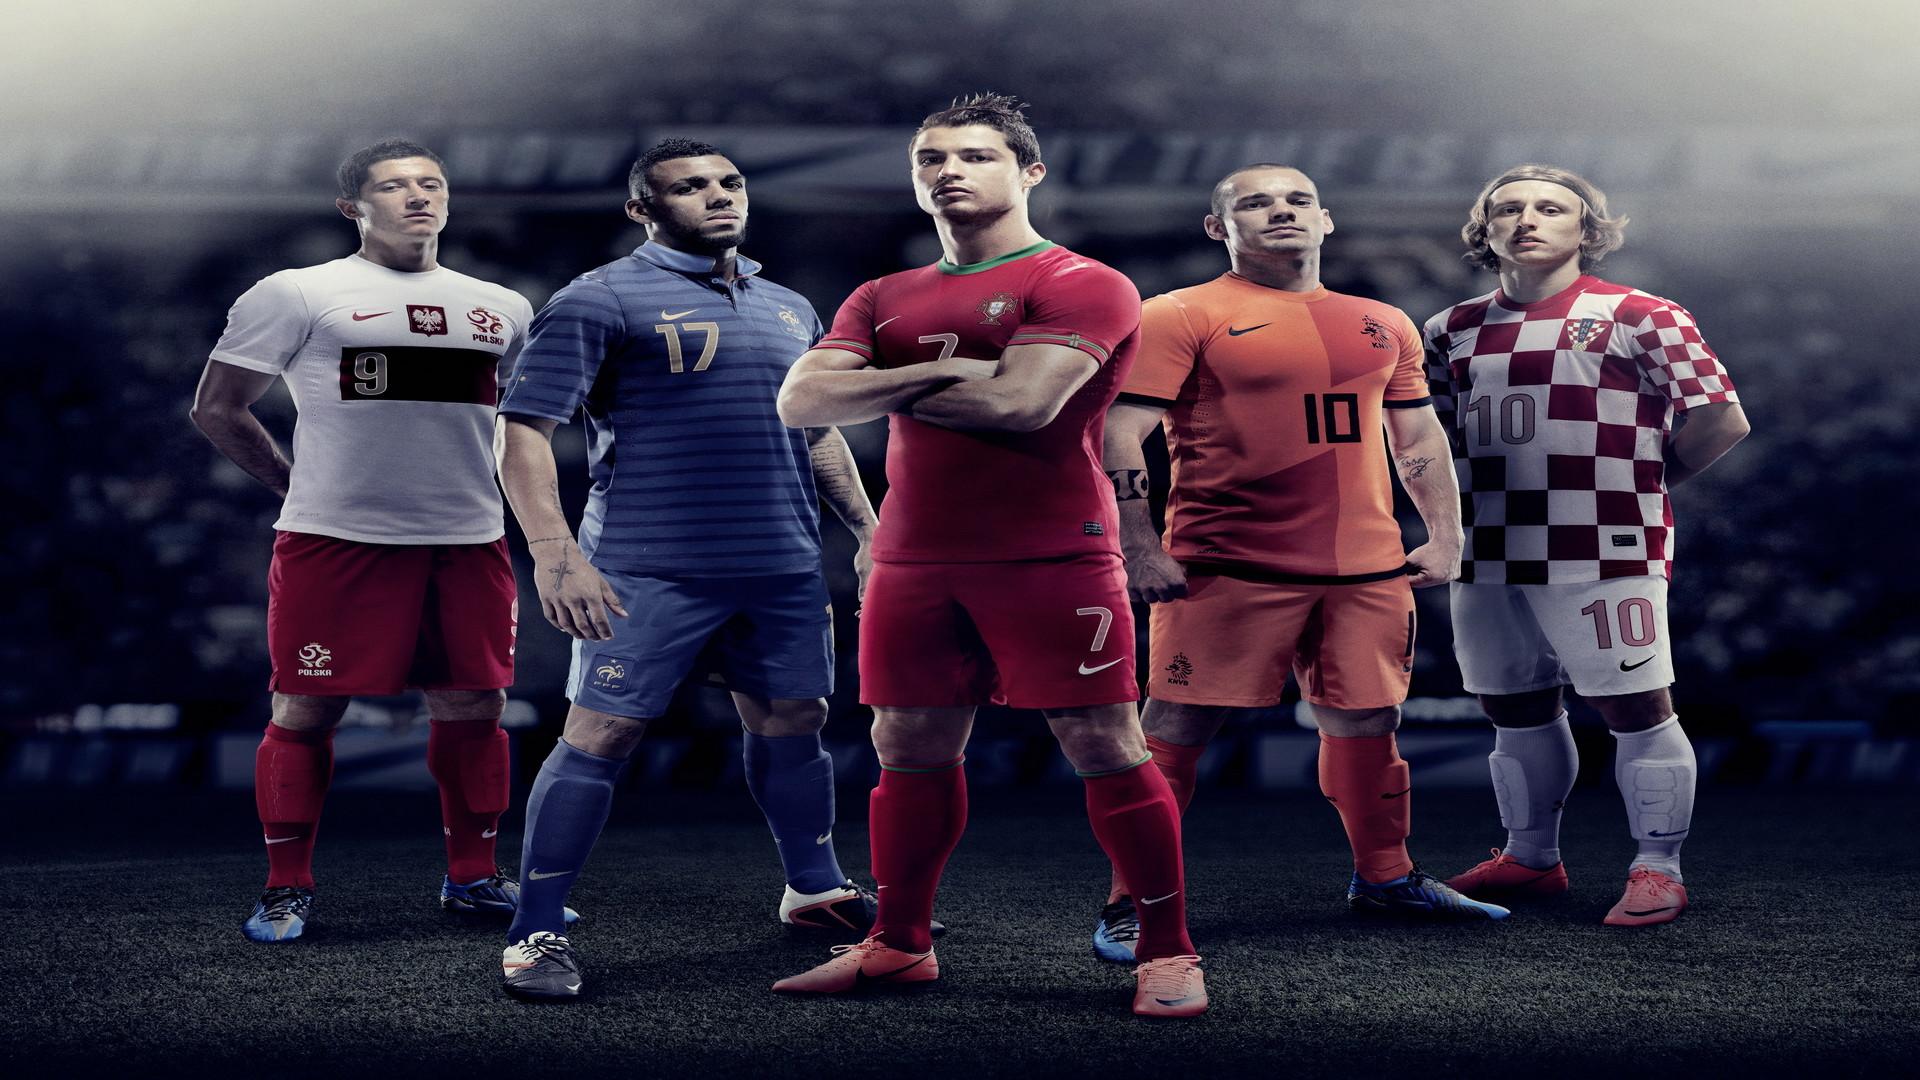 Res: 1920x1080, Soccer, Players, Hd, Wallpaper, Download Wallpaper, Hd Images, Artwork,  1920×1080 Wallpaper HD